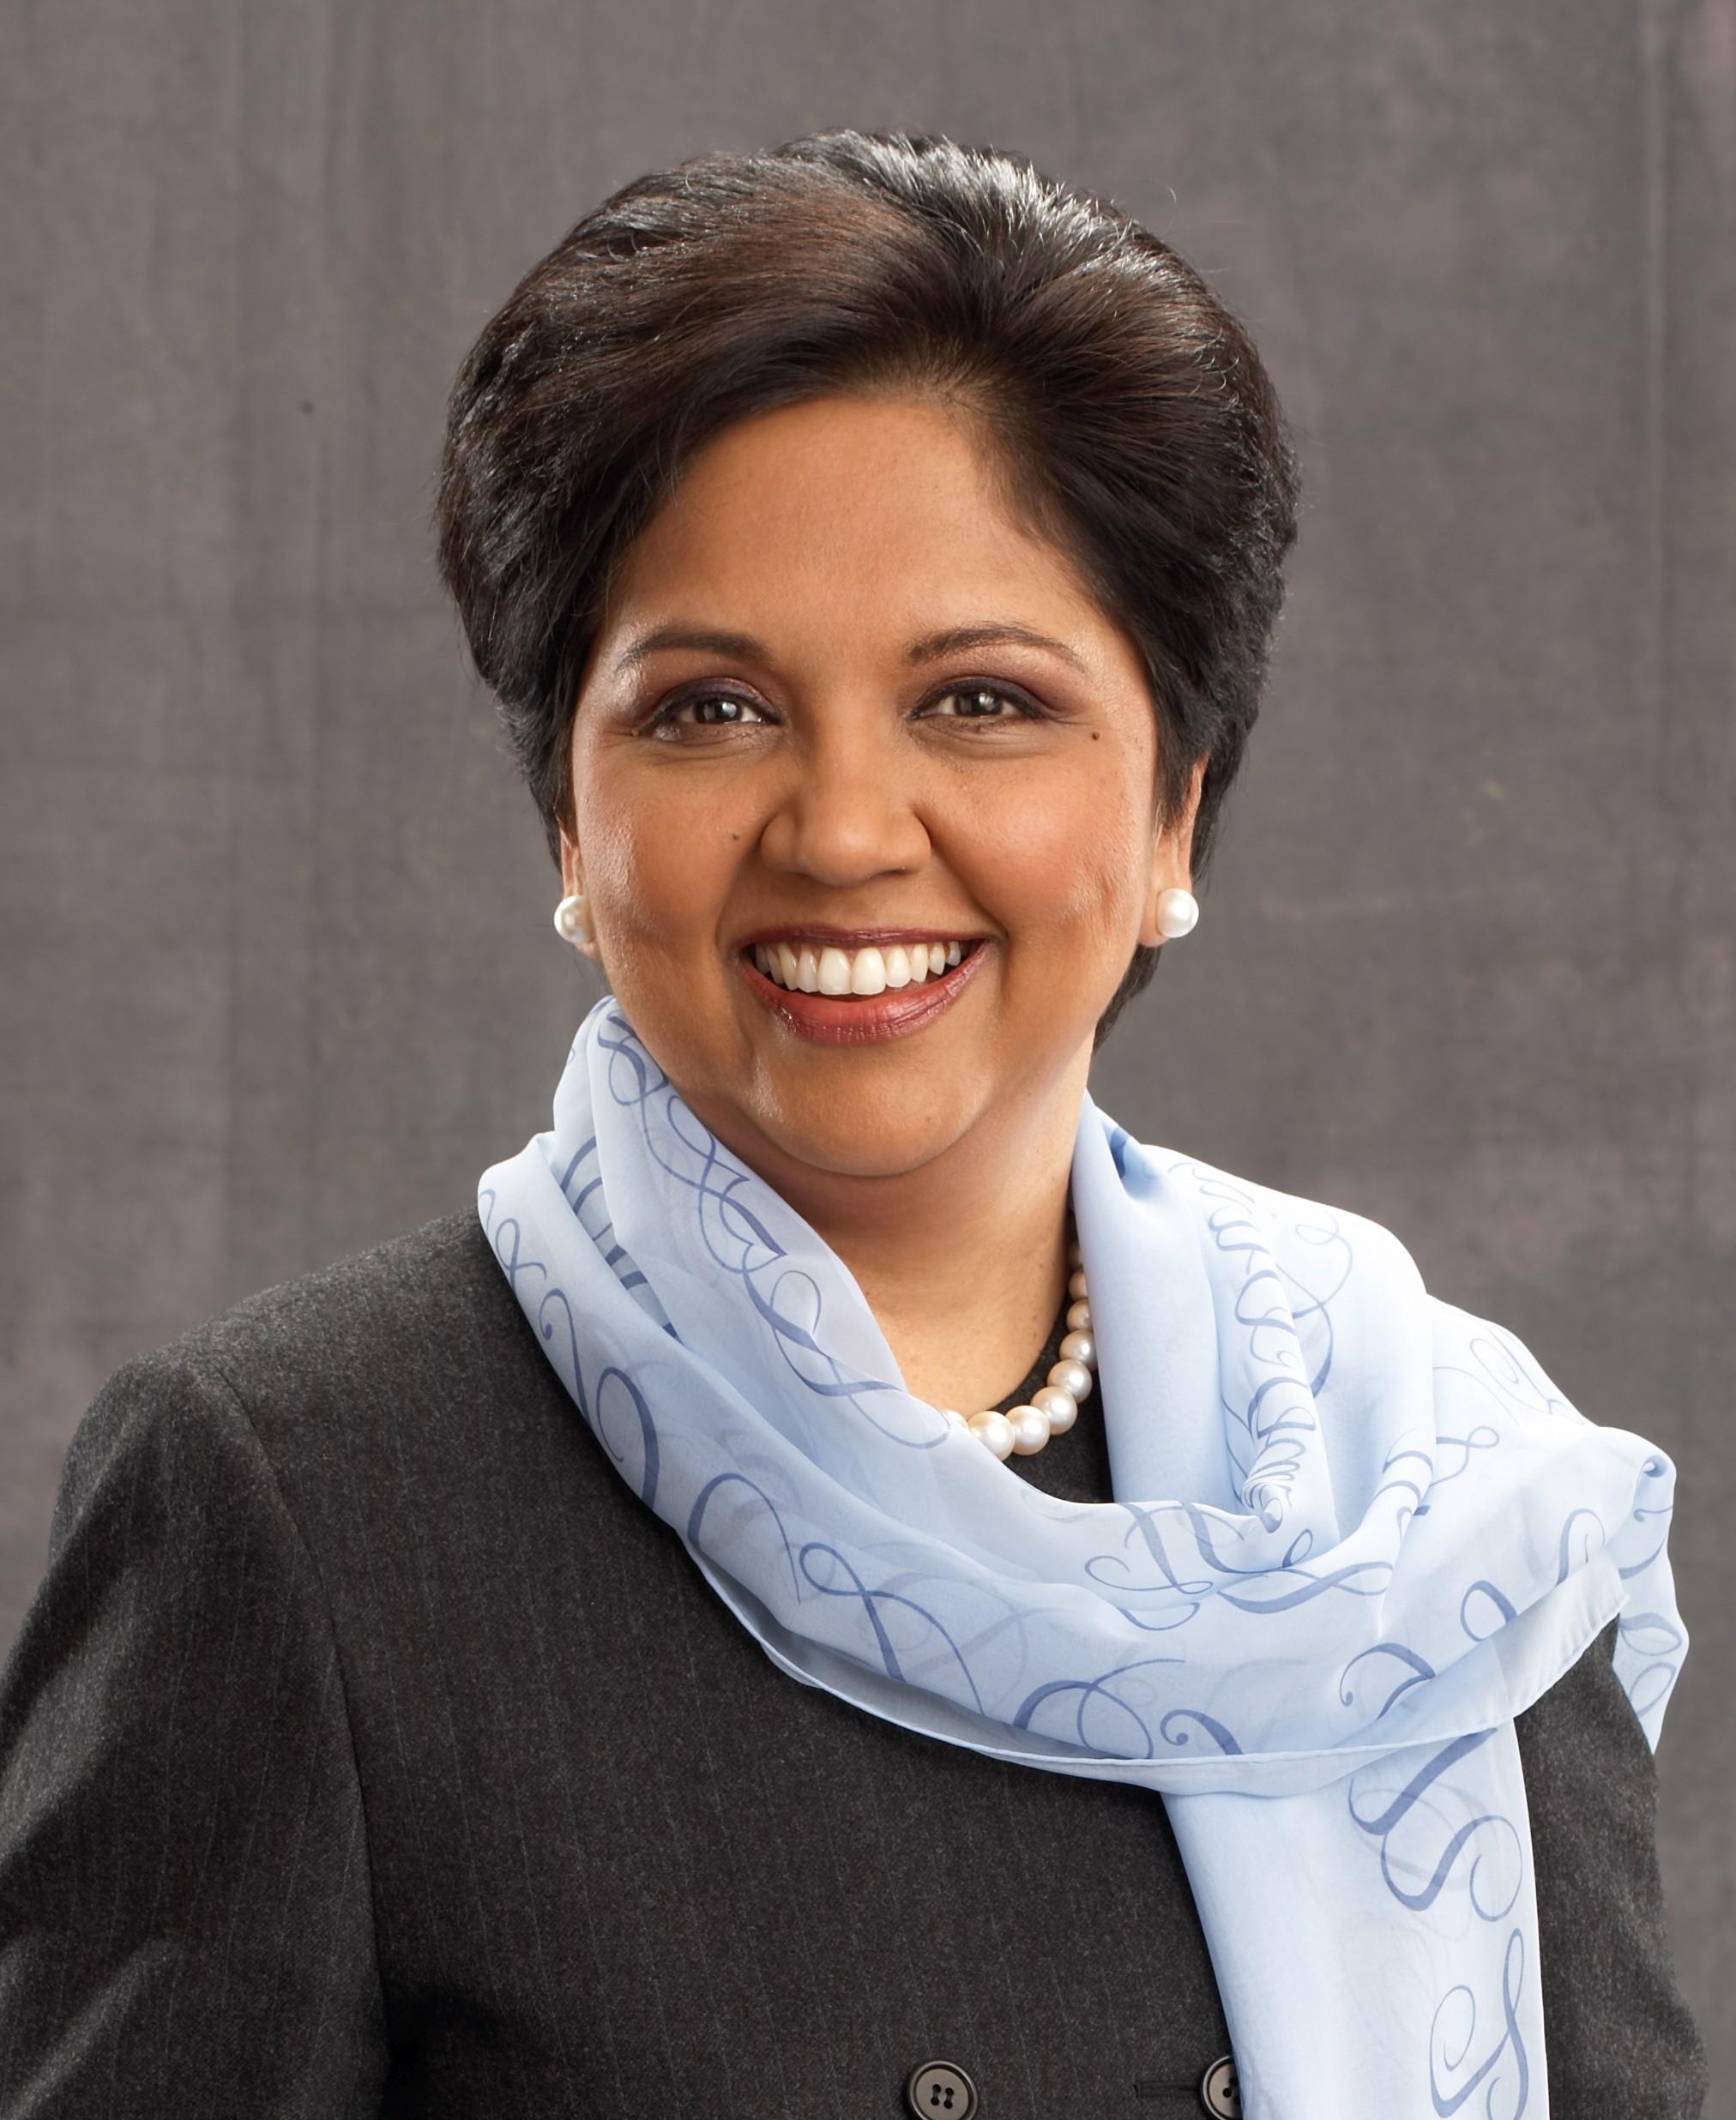 Indra Nooyi - CEO of PepsiCo